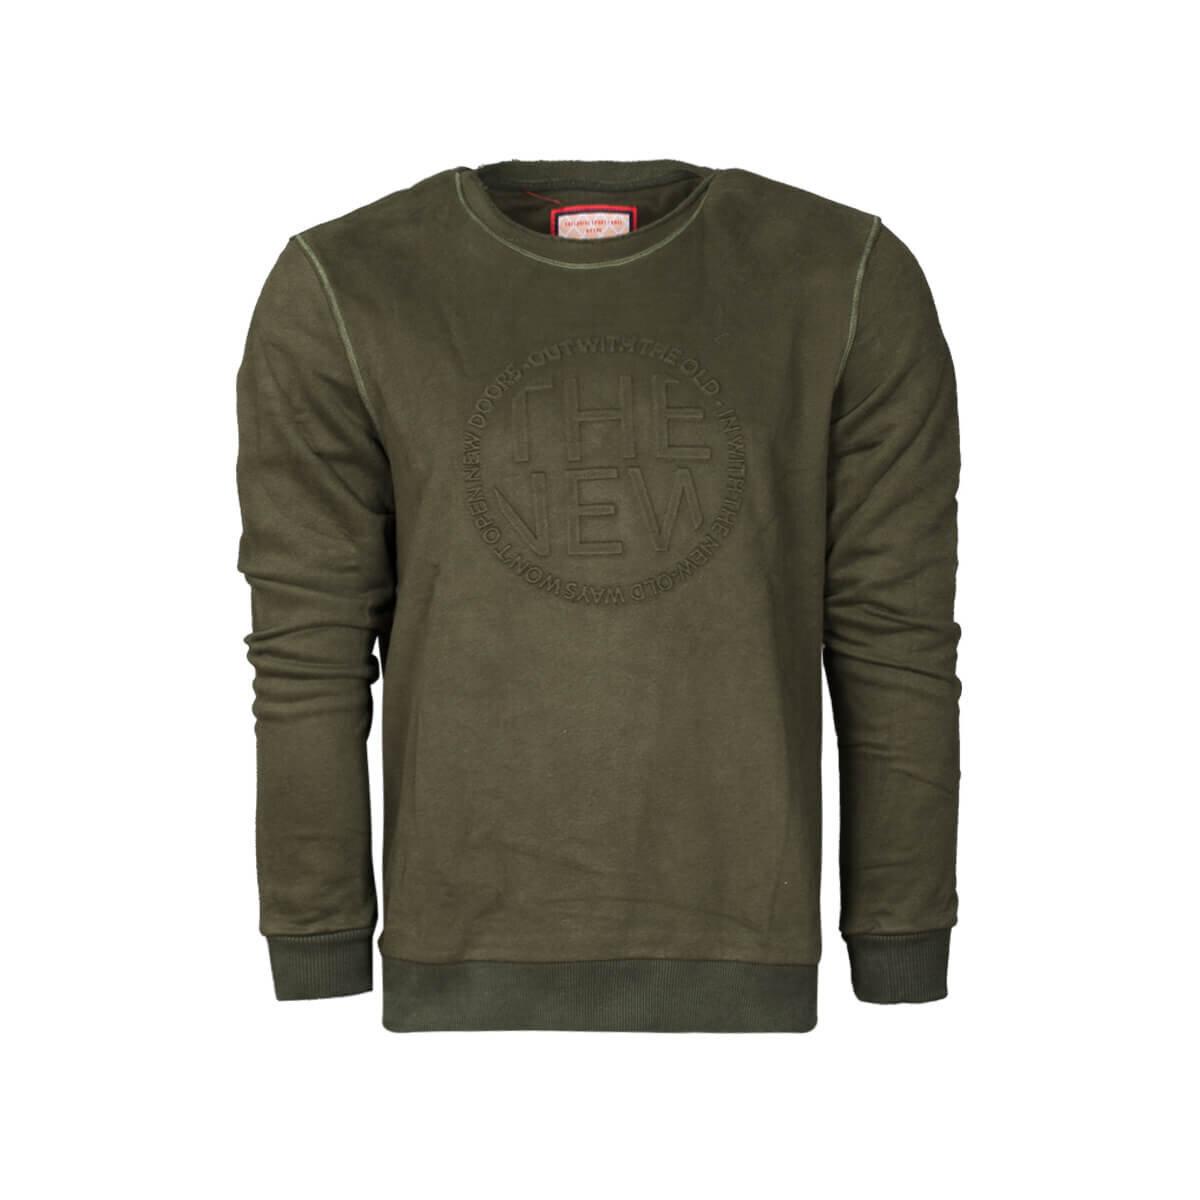 Haki Erkek Sweatshirt 85015 SW